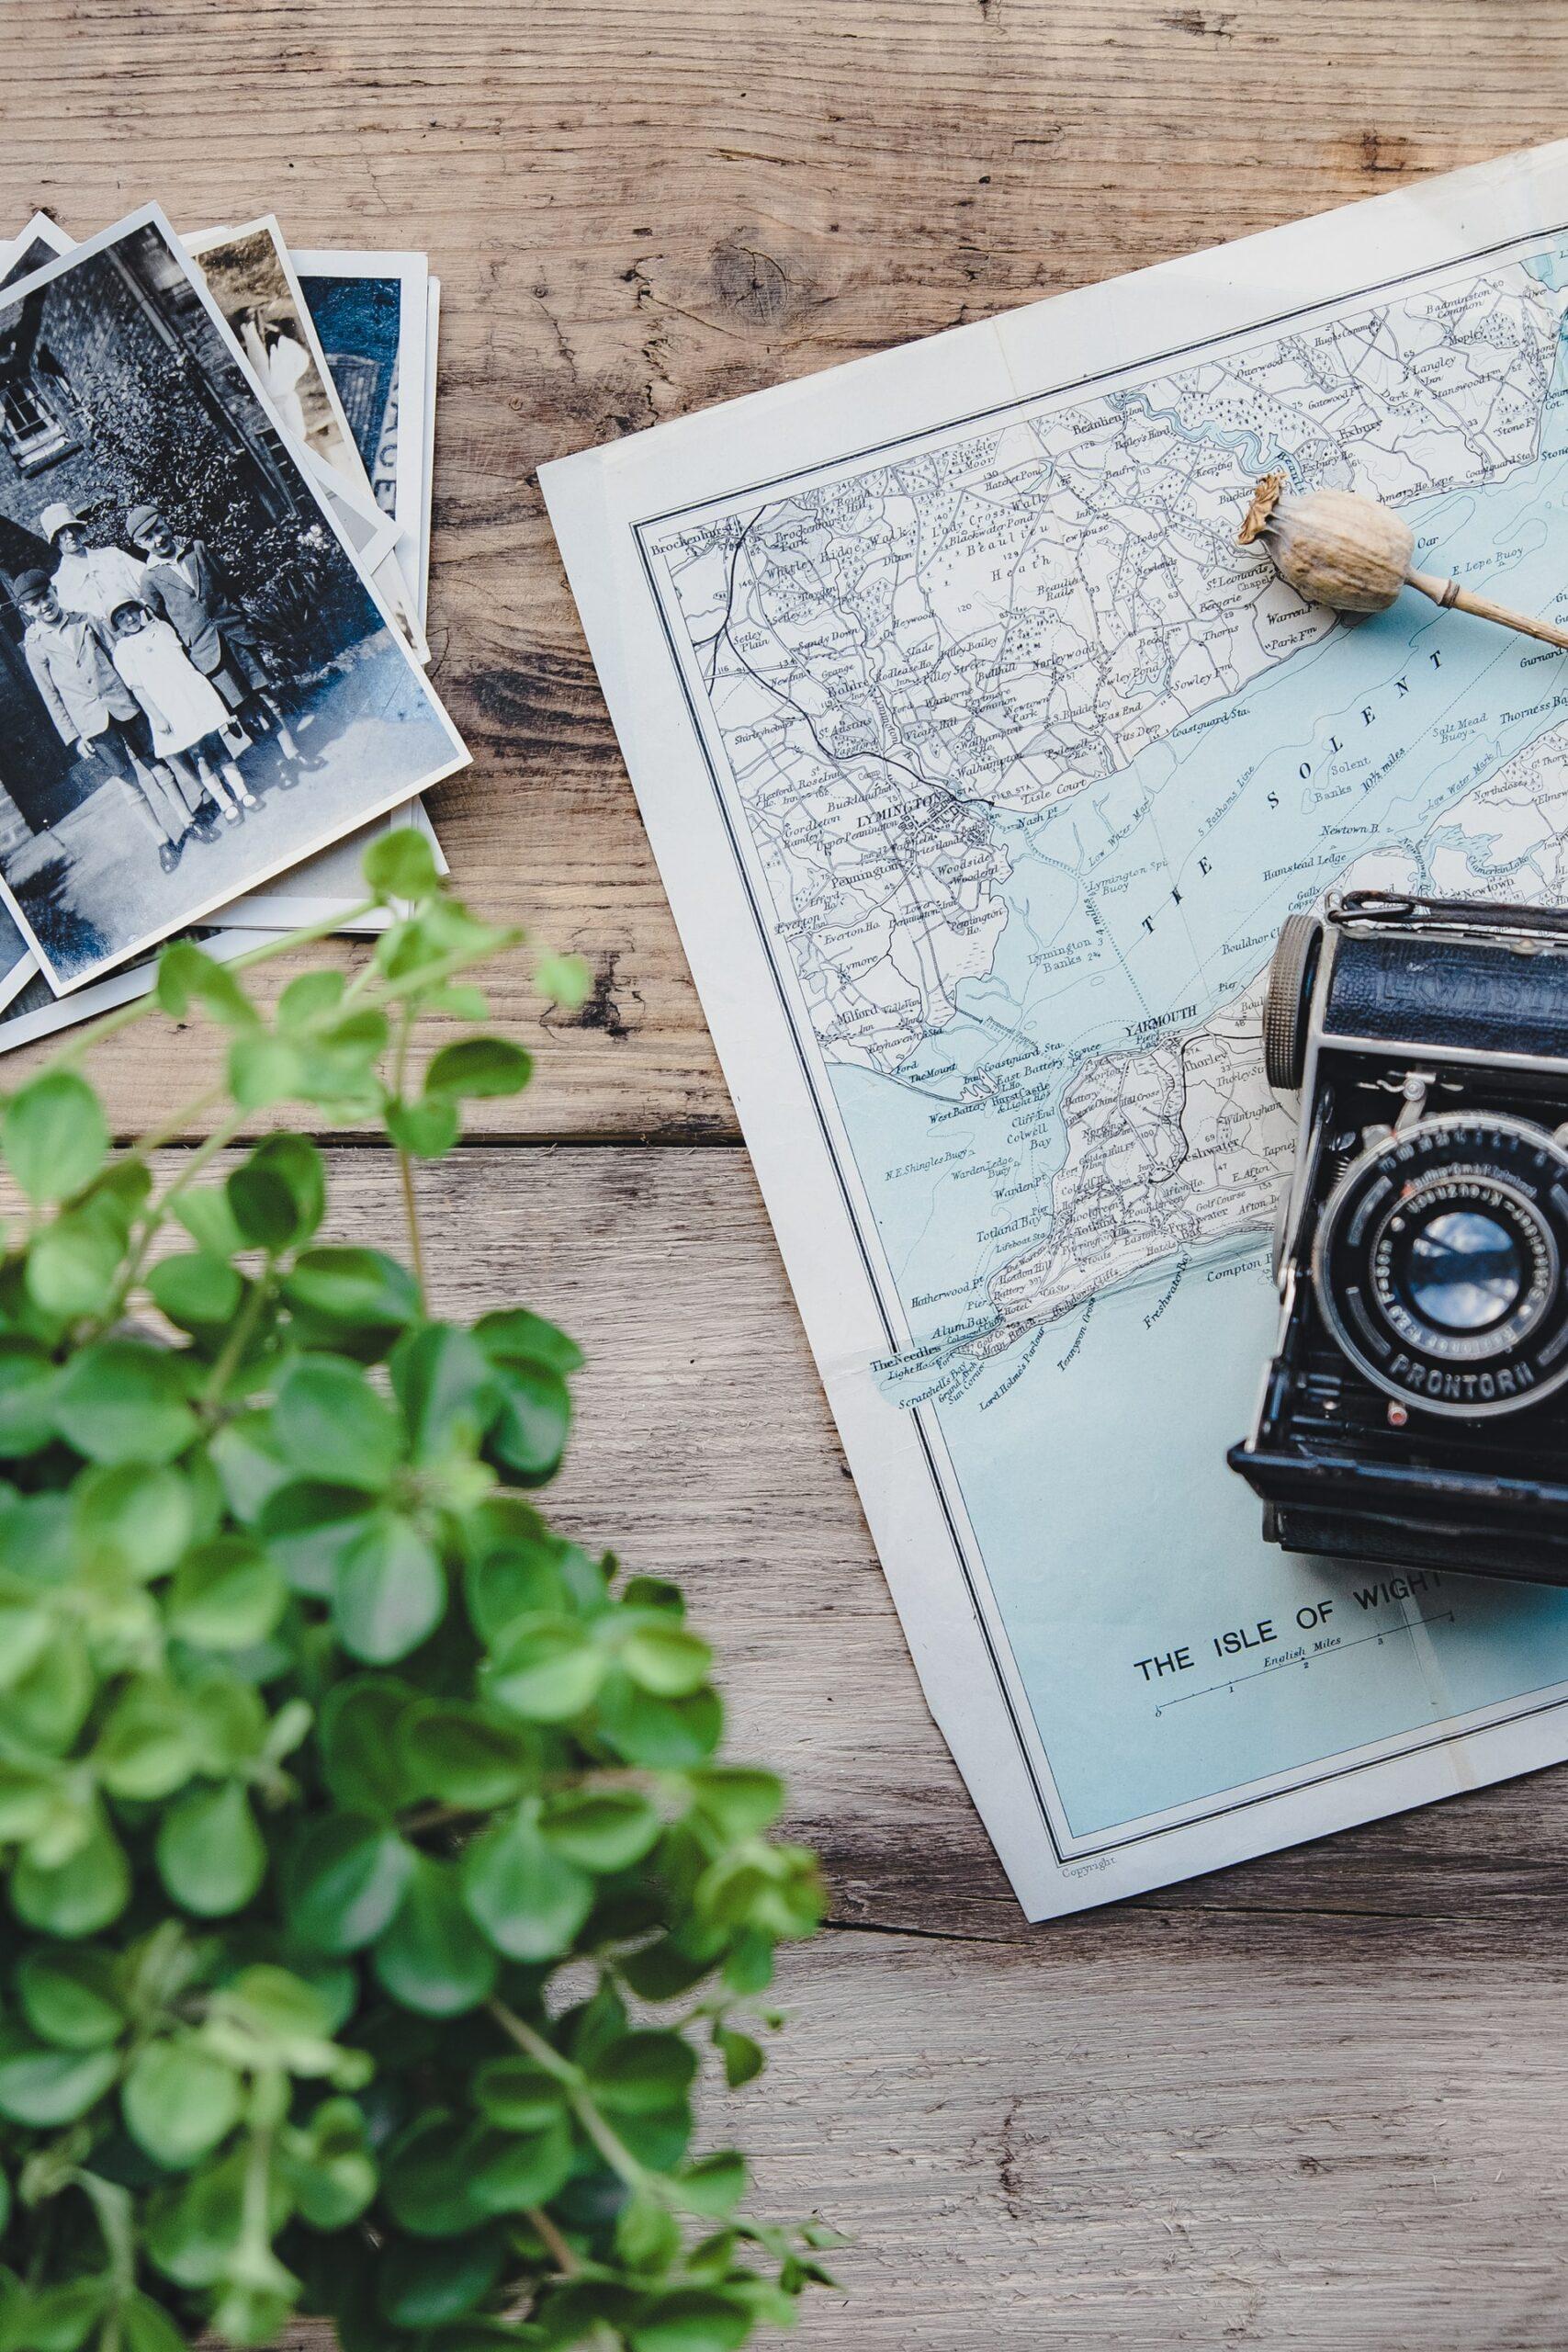 staycation trip ideas